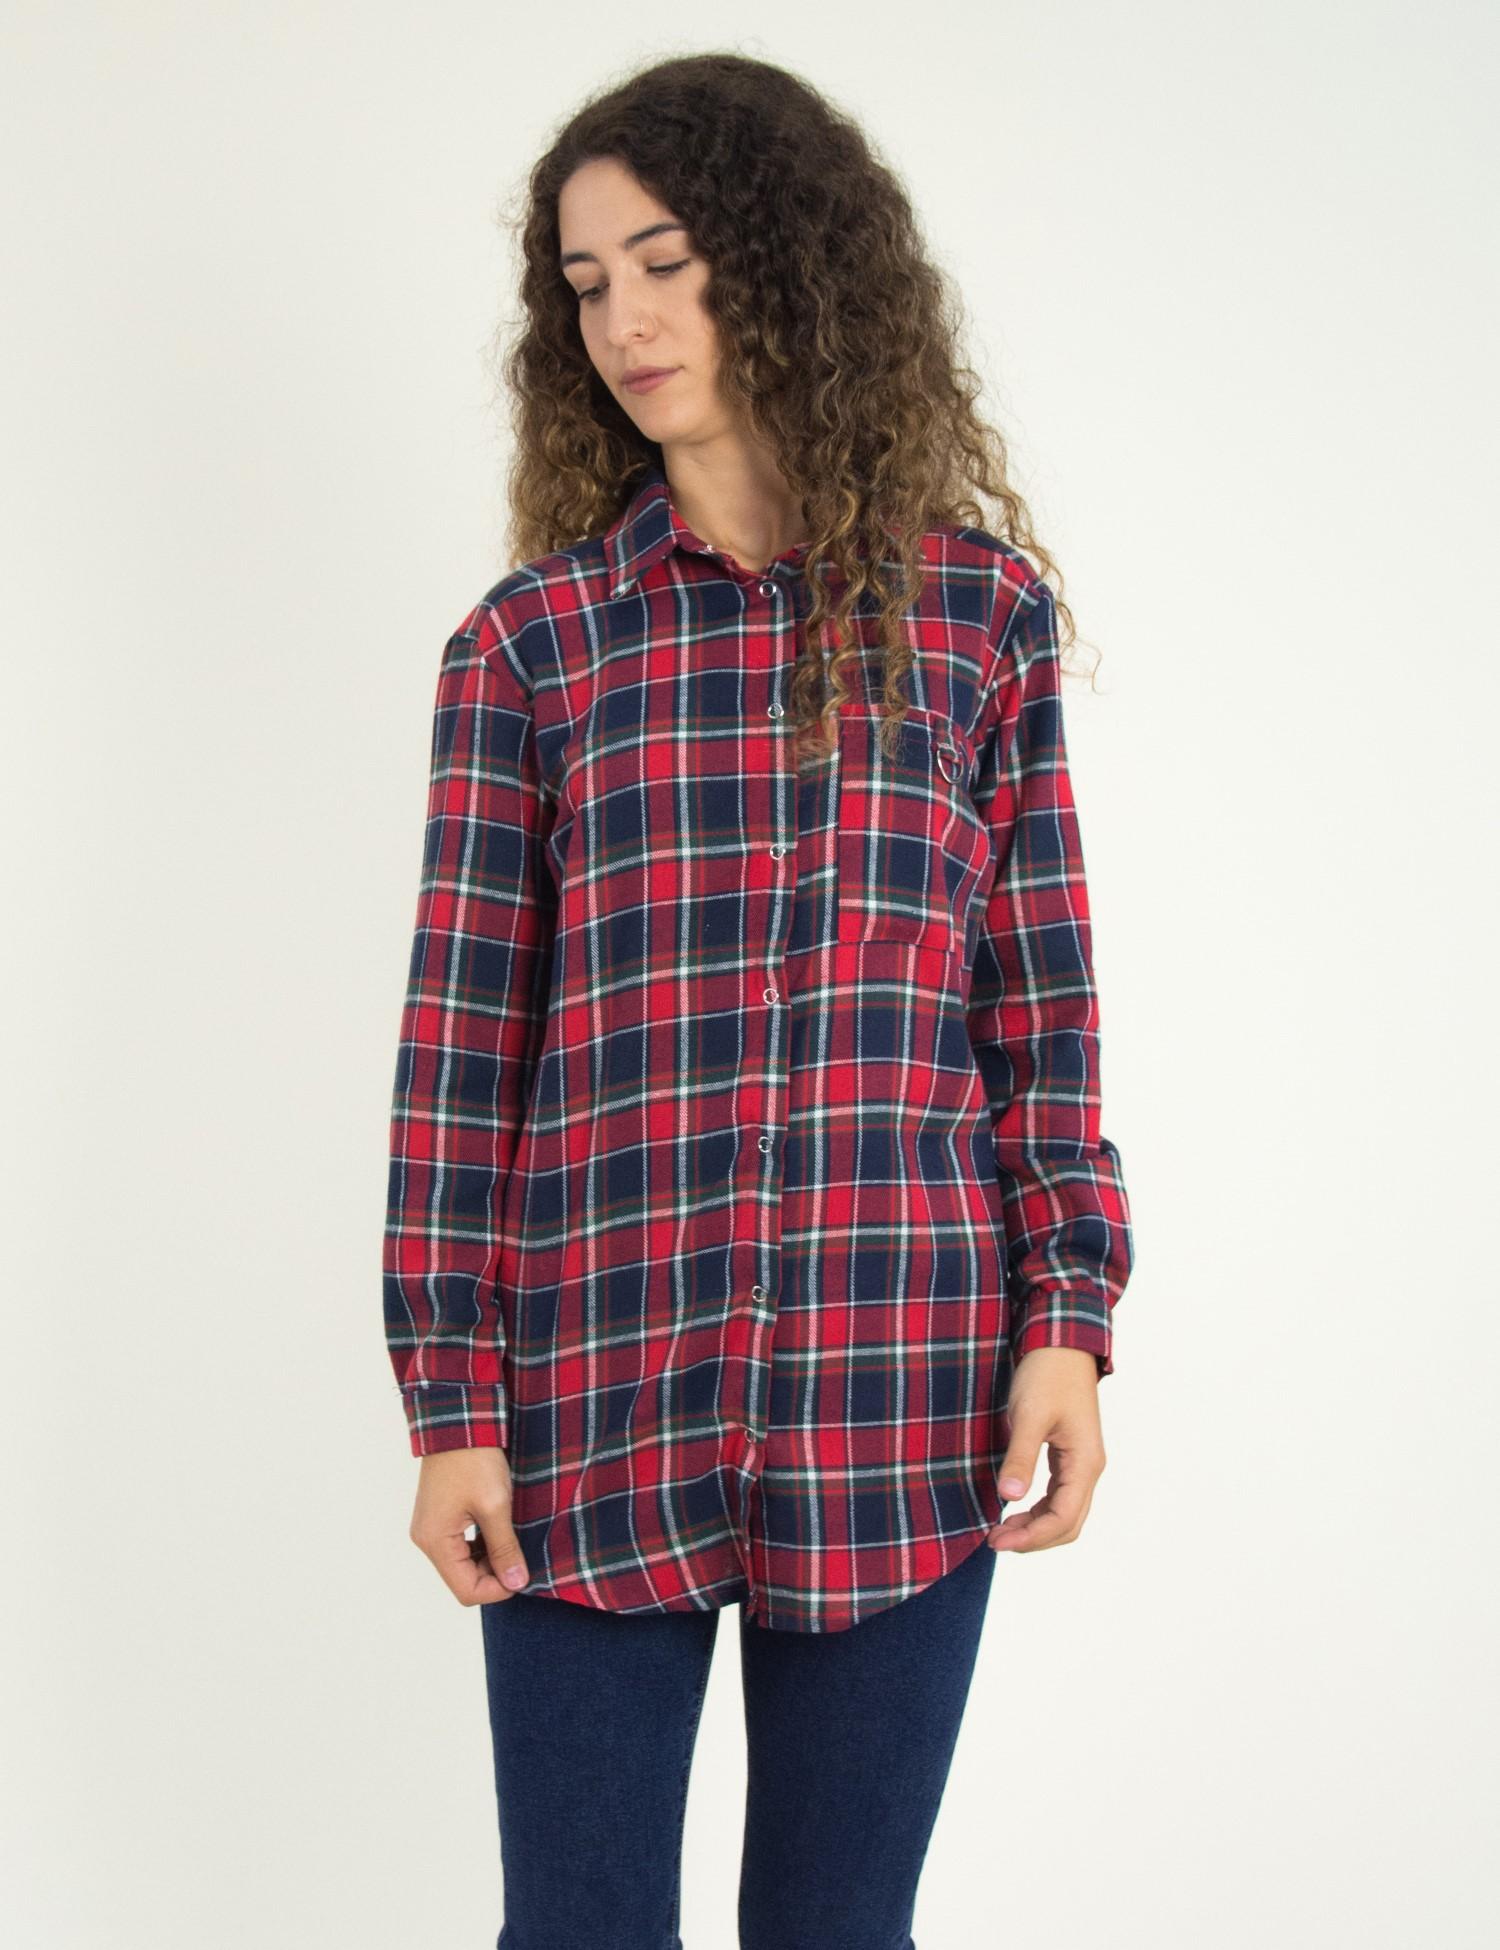 bf221d3d0cee Γυναικεία κόκκινη καρό πουκαμίσα Oversize Coocu 21002F